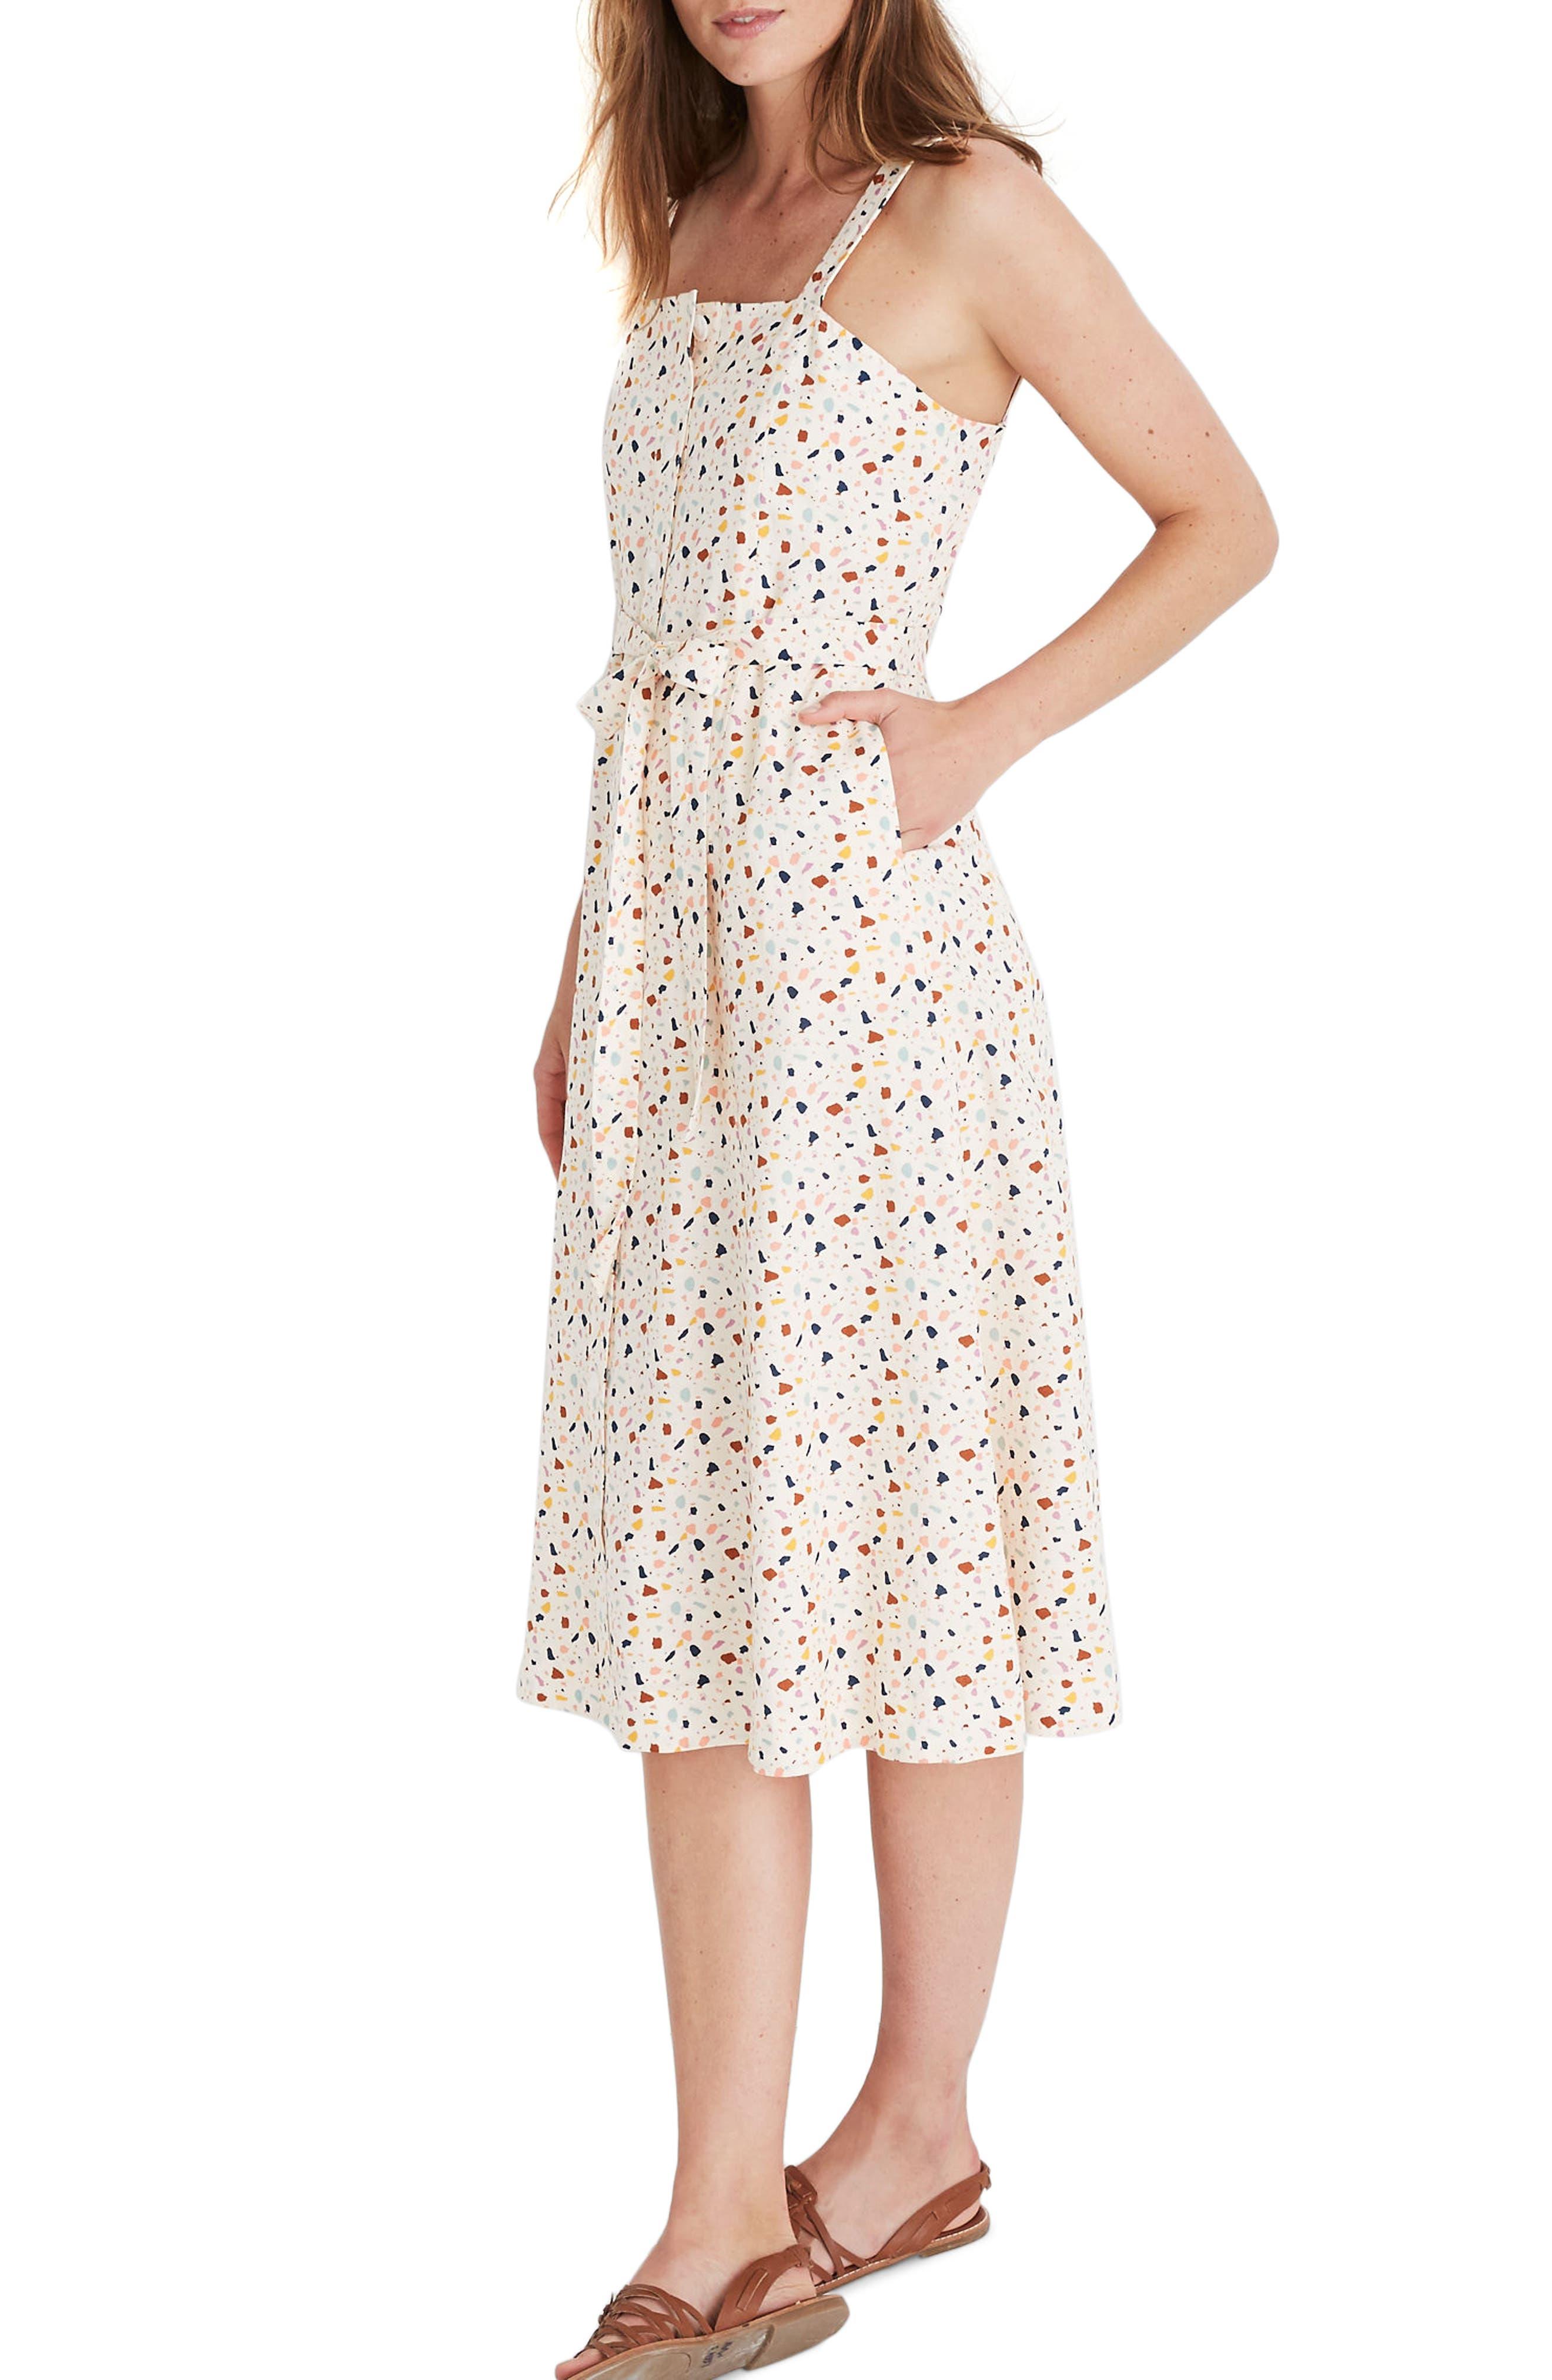 Madewell Terrazzo Square Neck Midi Dress, 2 (similar to 20W-2) - Ivory